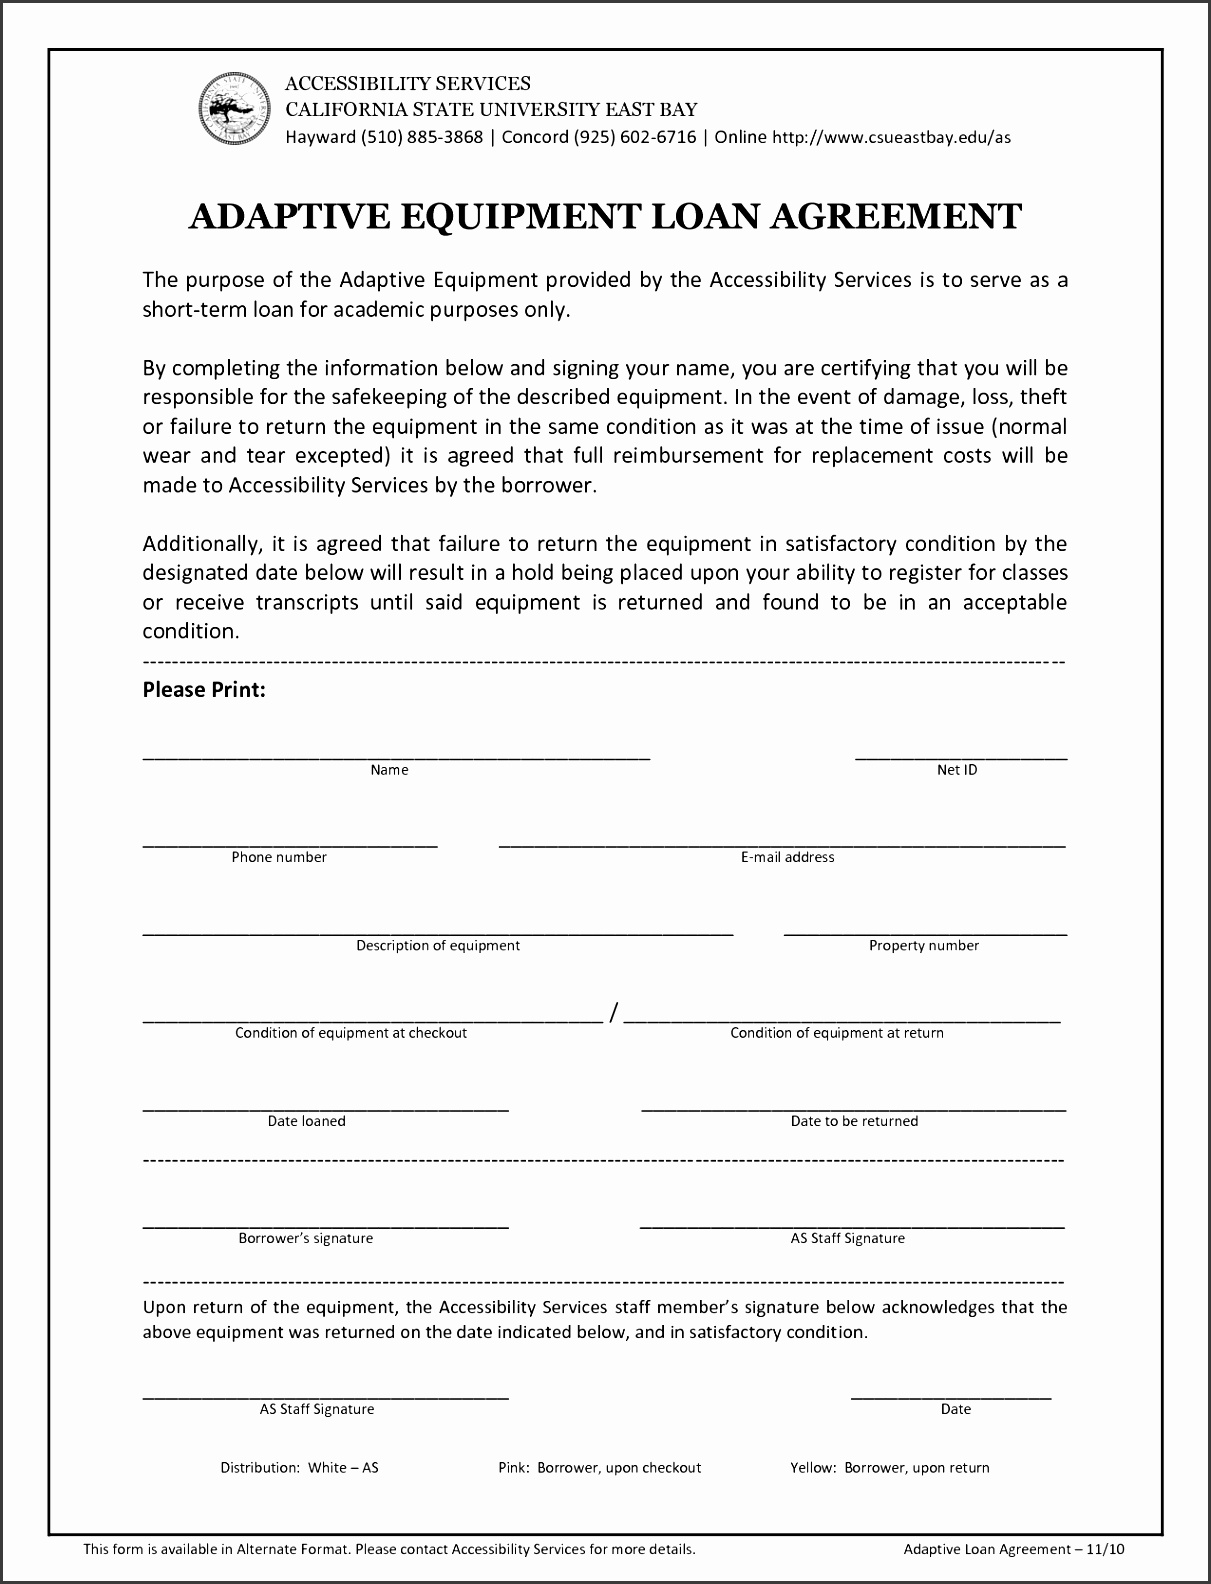 Loan Agreement Draft Raffle Tickets Template Free Online Template Loan  Agreement Doc Home Purchase Agreement Form  Loan Agreement Doc